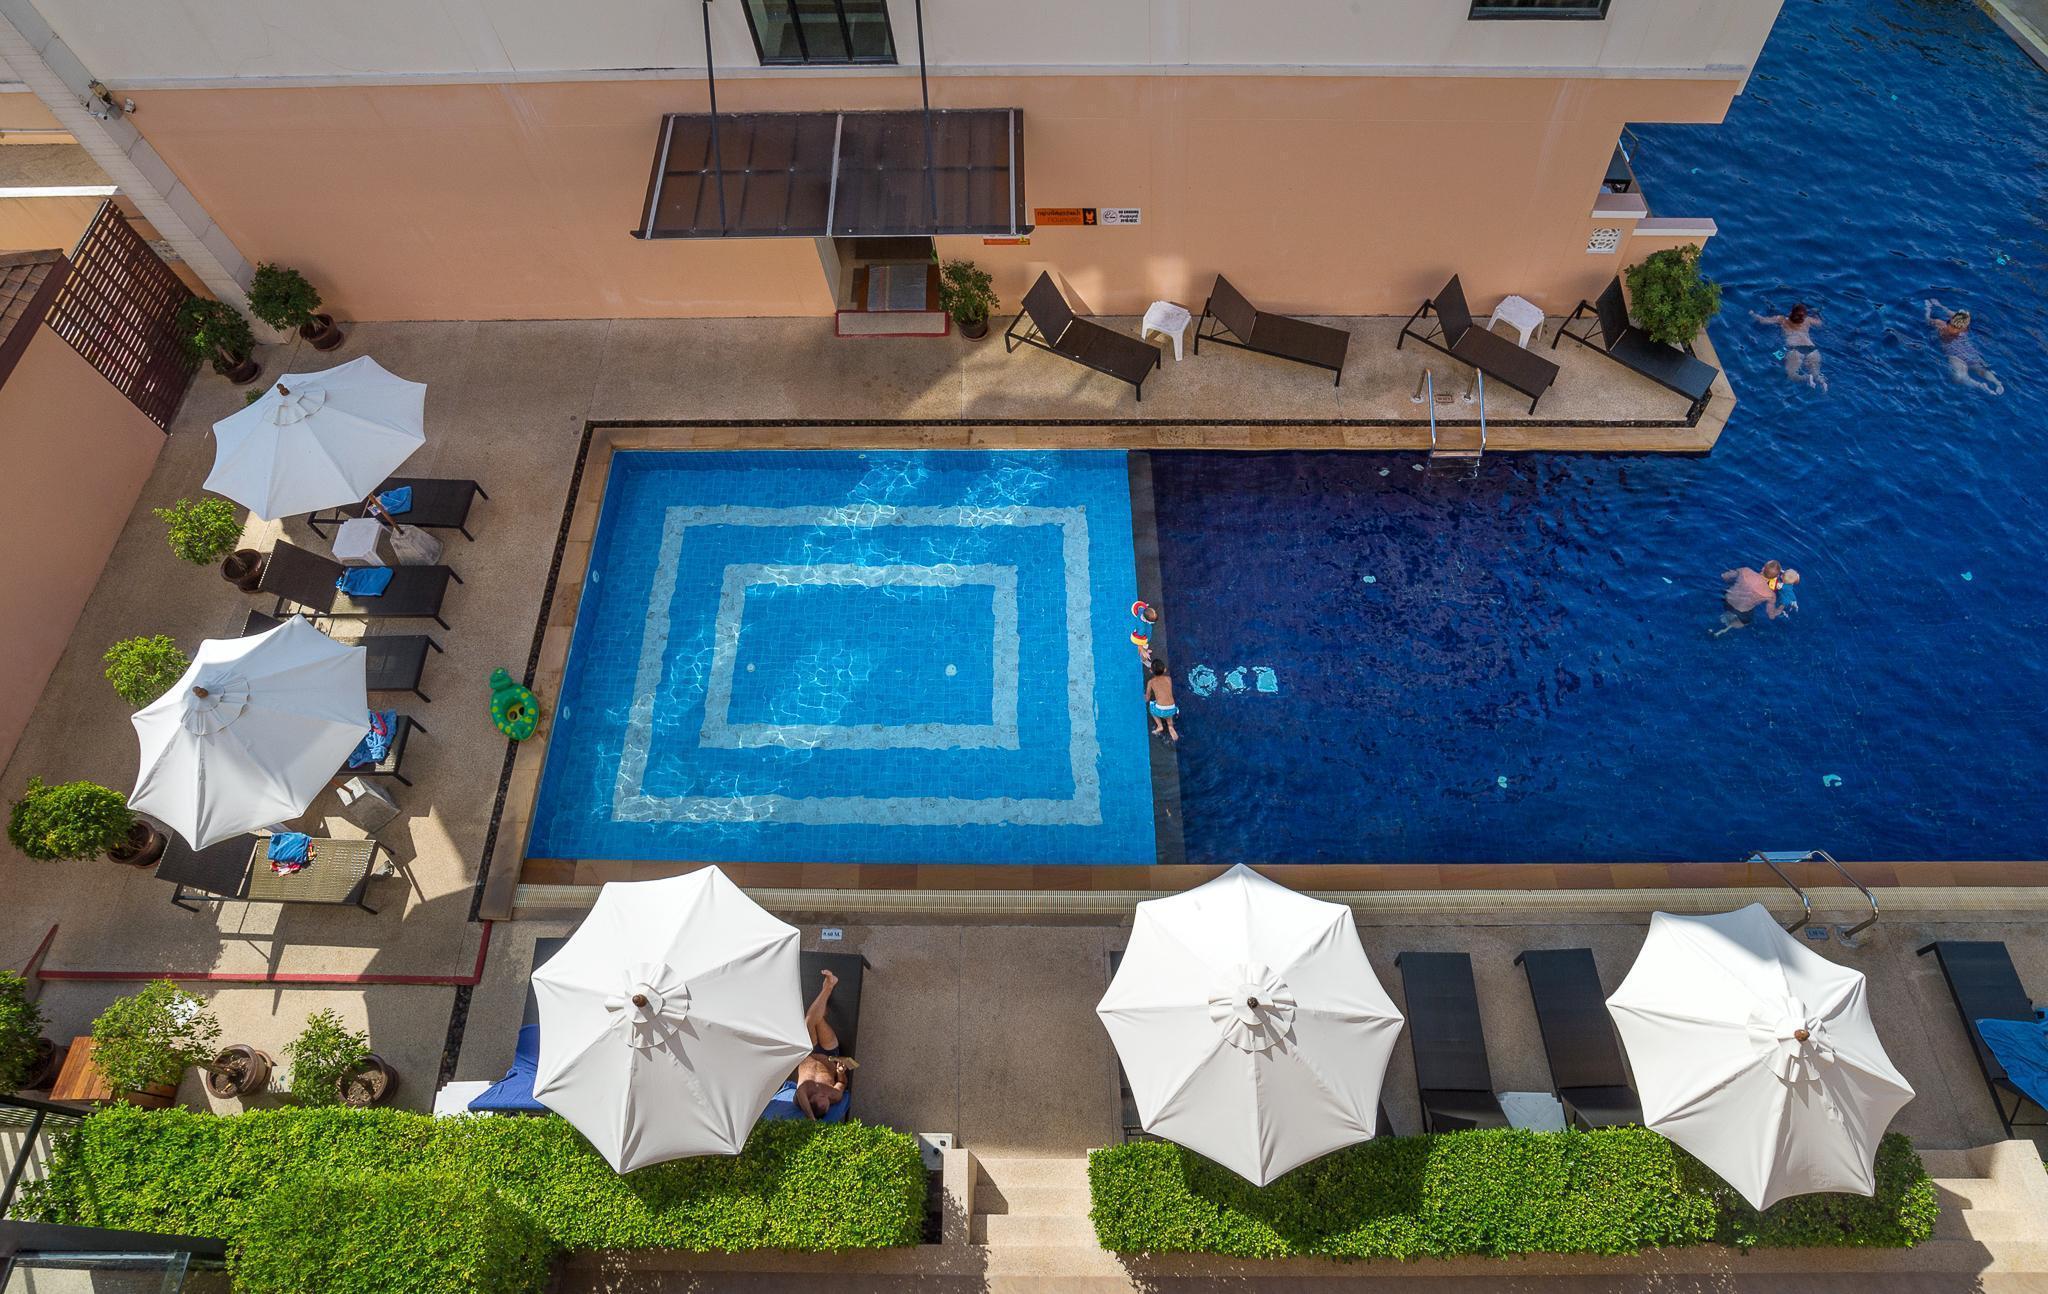 Srisuksant Resort ศรีสุขสันต์ รีสอร์ท